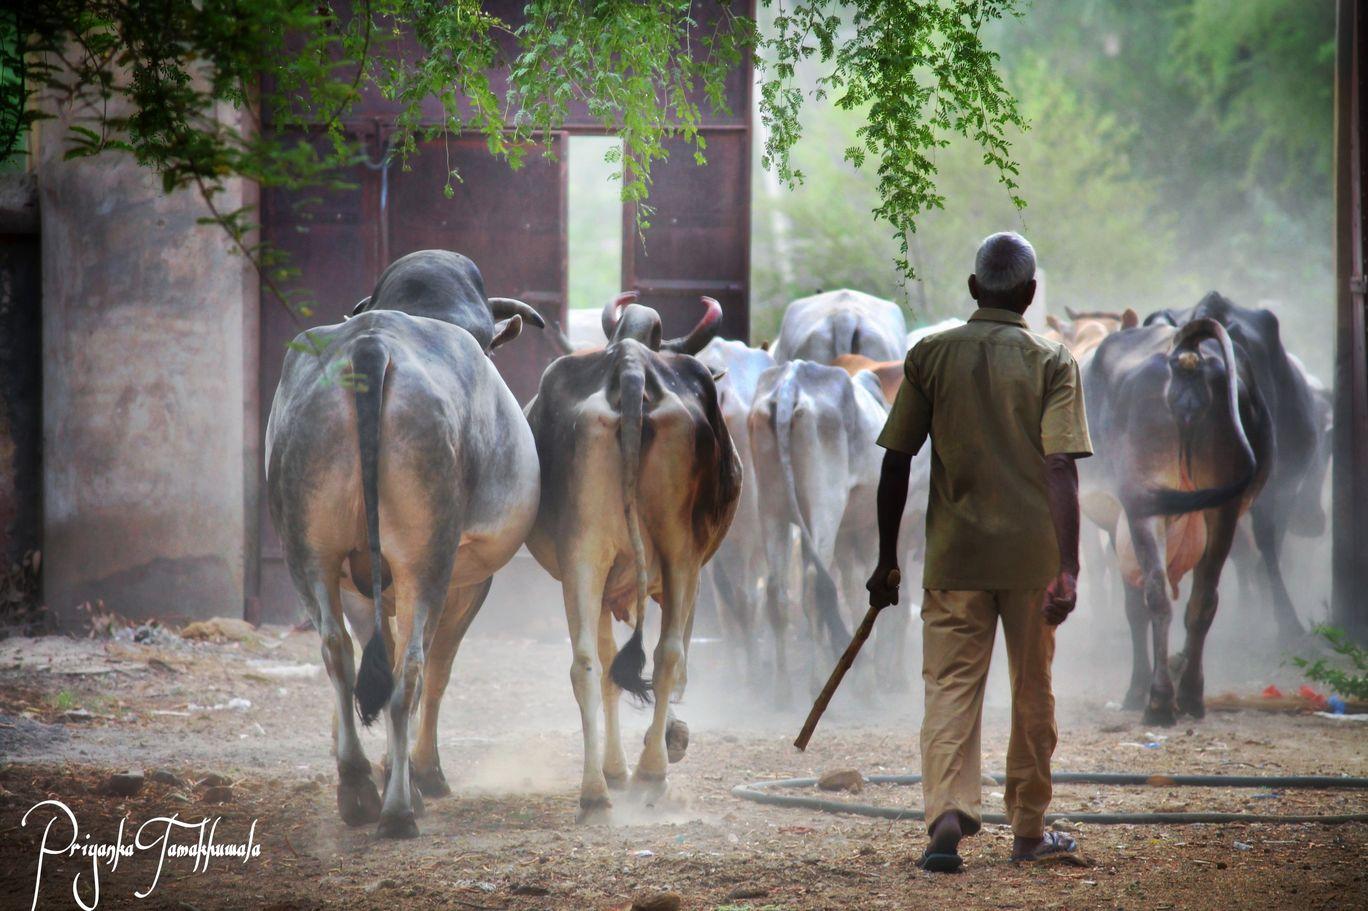 Photo of Jhunjhunu By priyanka tamakhuwala